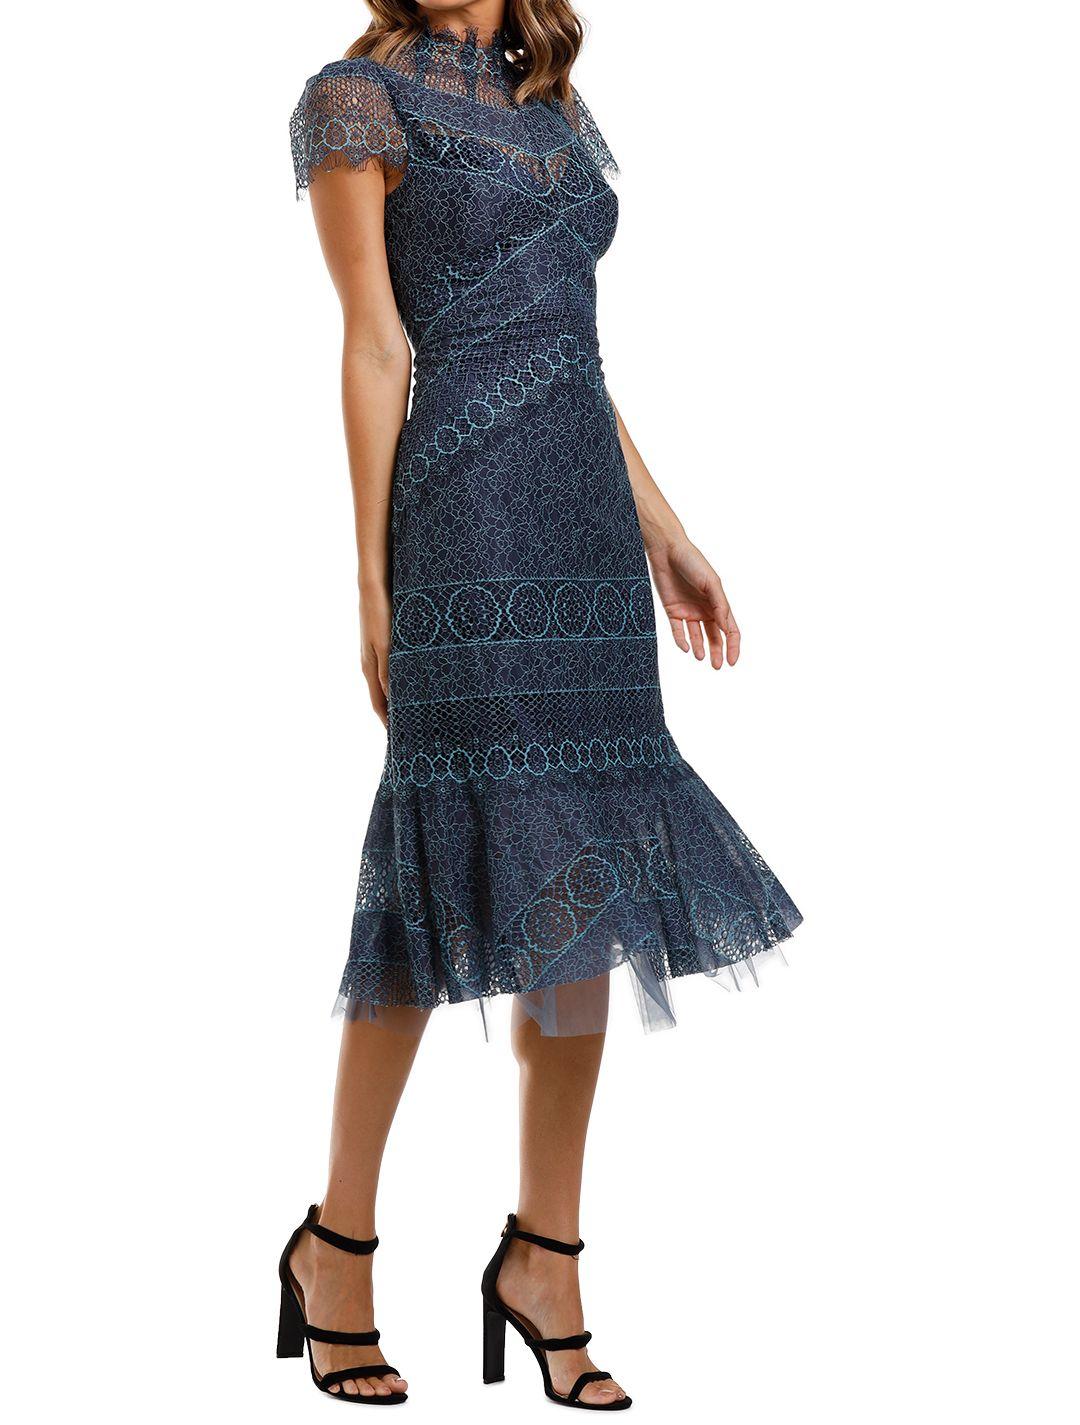 Moss and Spy Riviera High Neck Dress Lace